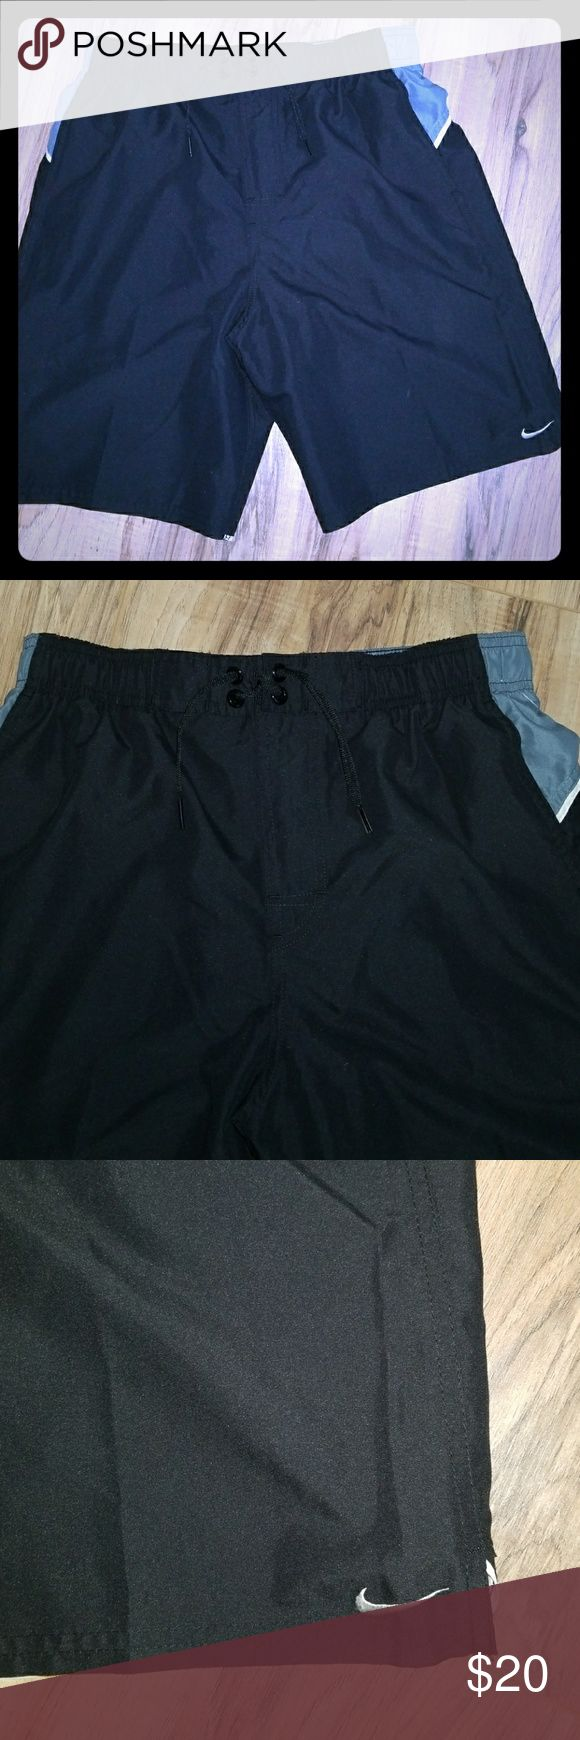 New men's Nike swim shorts black size small Never worn, new black swim shorts by Nike size small.  Has built in liner. Nike logo Nike Swim Swim Trunks